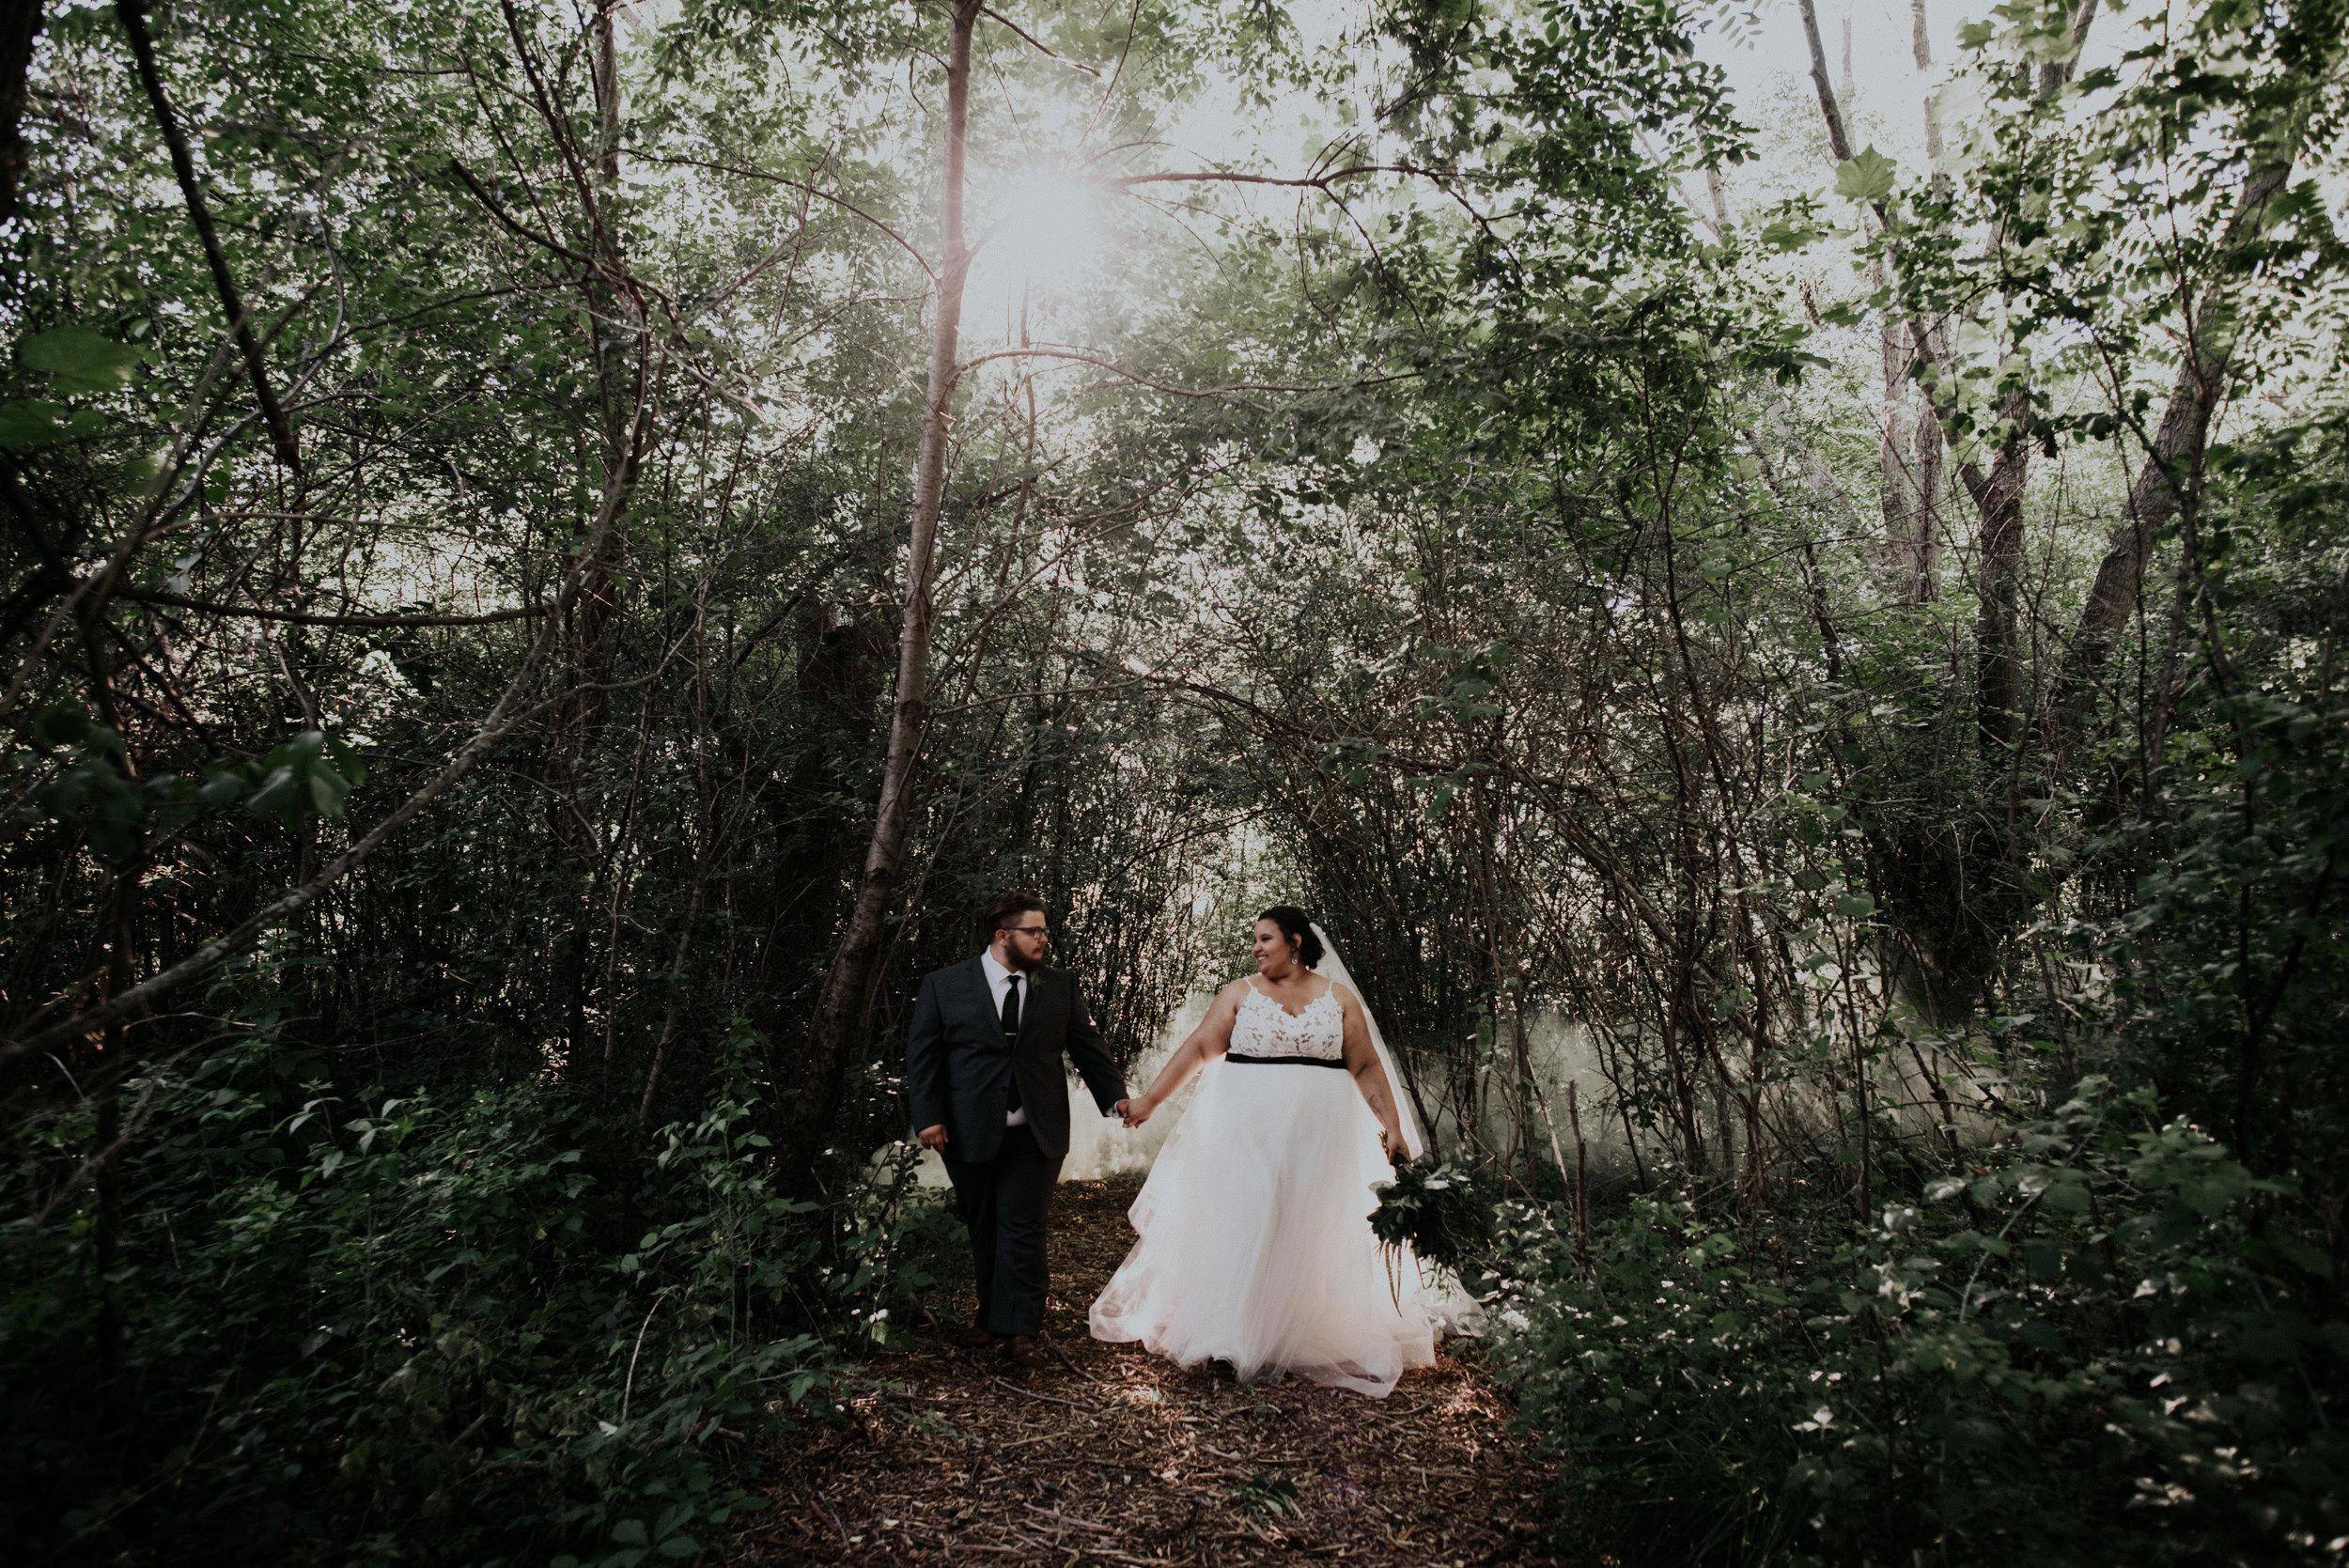 BridesbyYoung-RealWedding-PlusSizeBridal-BillyCourtney-JurassicParkTheme-41.jpg